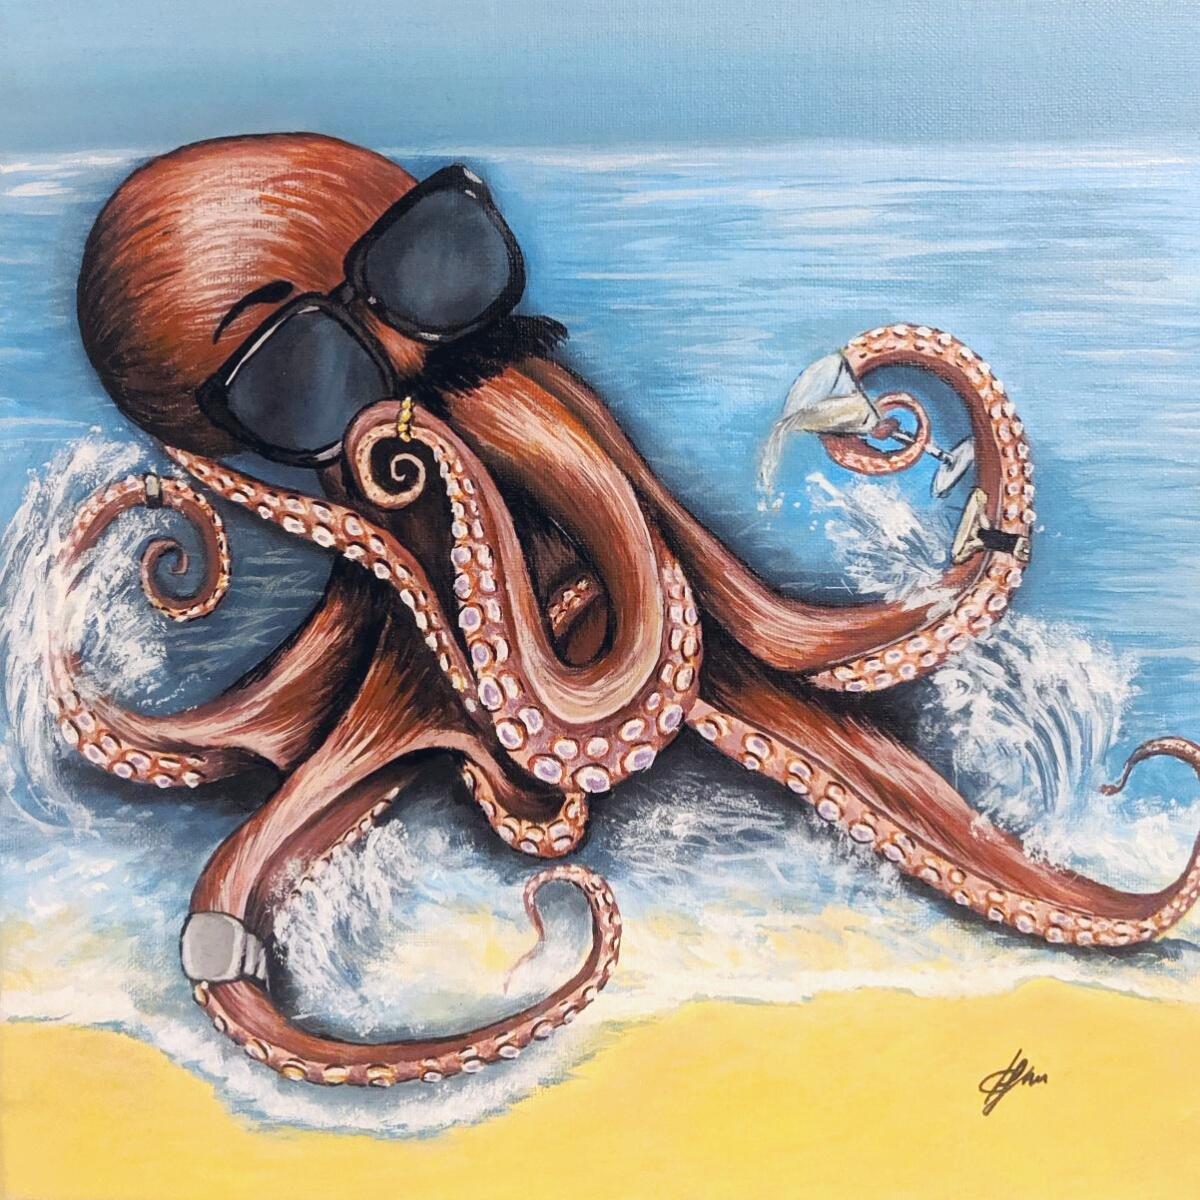 Octopus-on-beach-painting